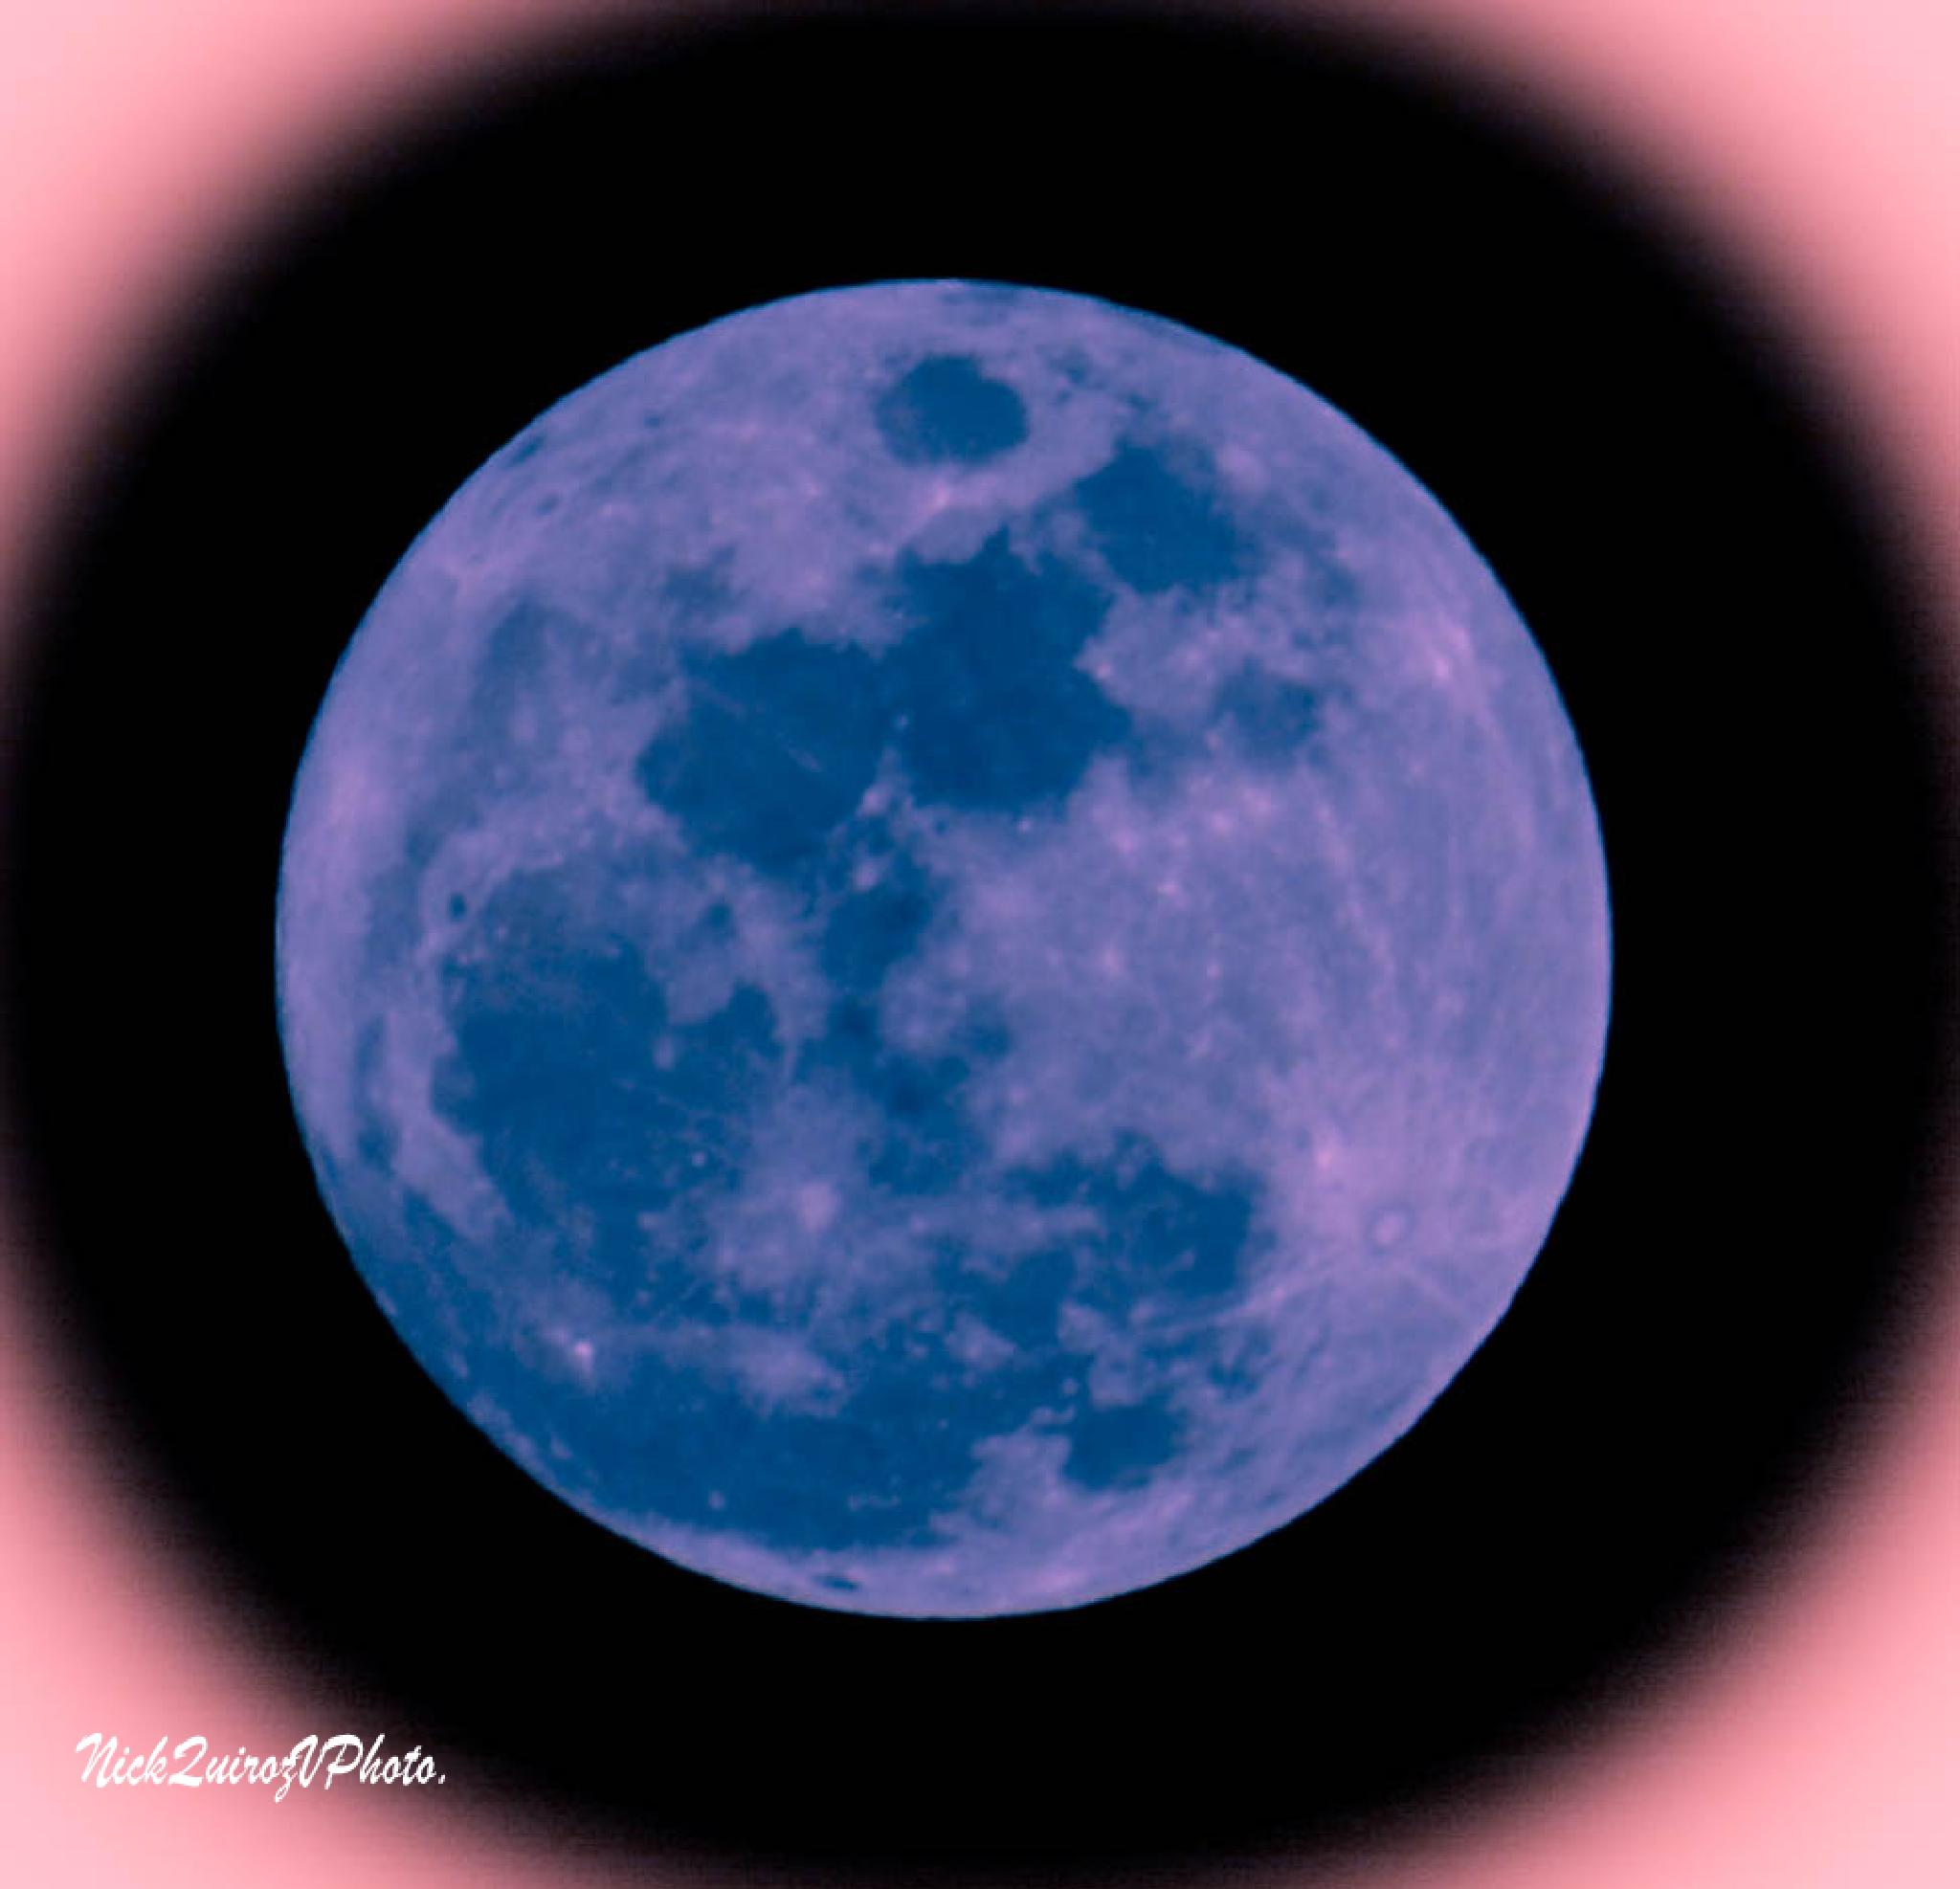 full moon,Miami.January 4th 2015 by nickquirozvillavicencio